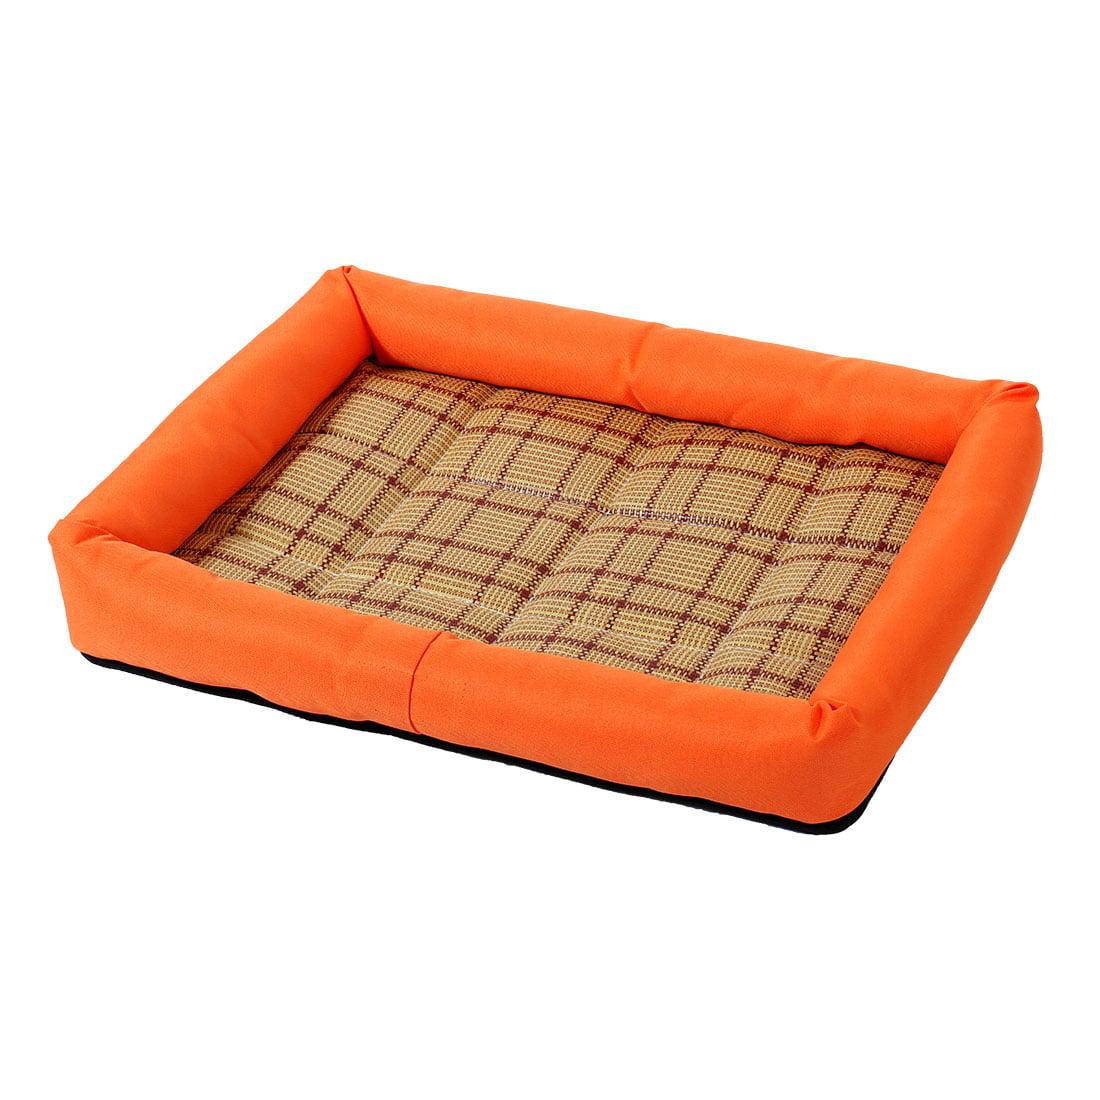 Unique Bargains Summer Cool Heat Resistant Bamboo Dog Cushion Pet Cat Sleeping Bed Mat M Orange